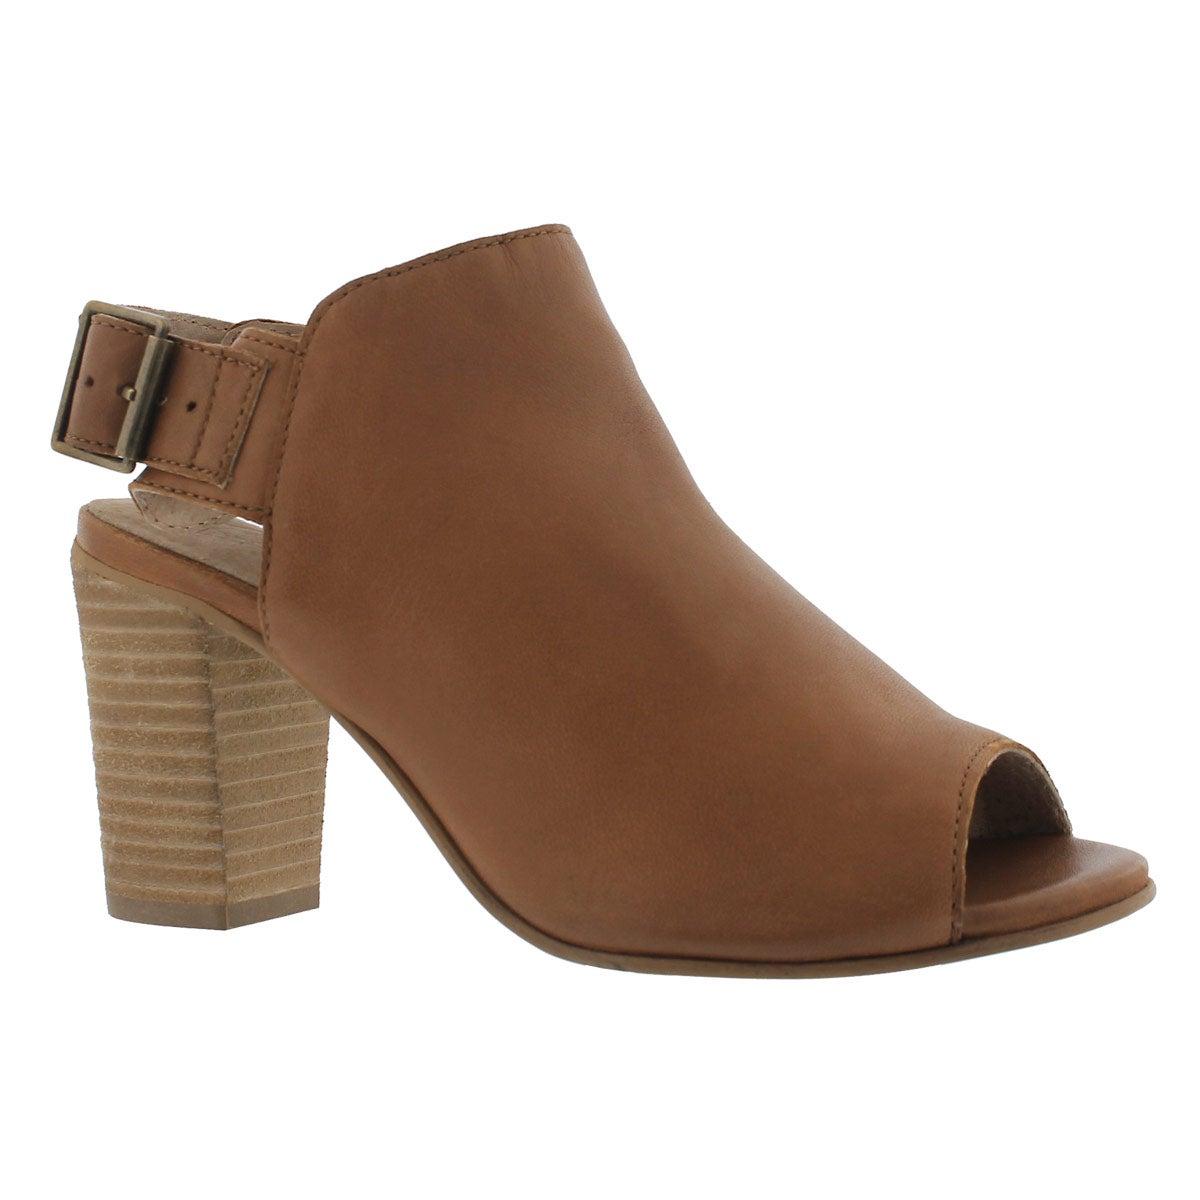 Women's FAYE tobacco peep toe dress sandals